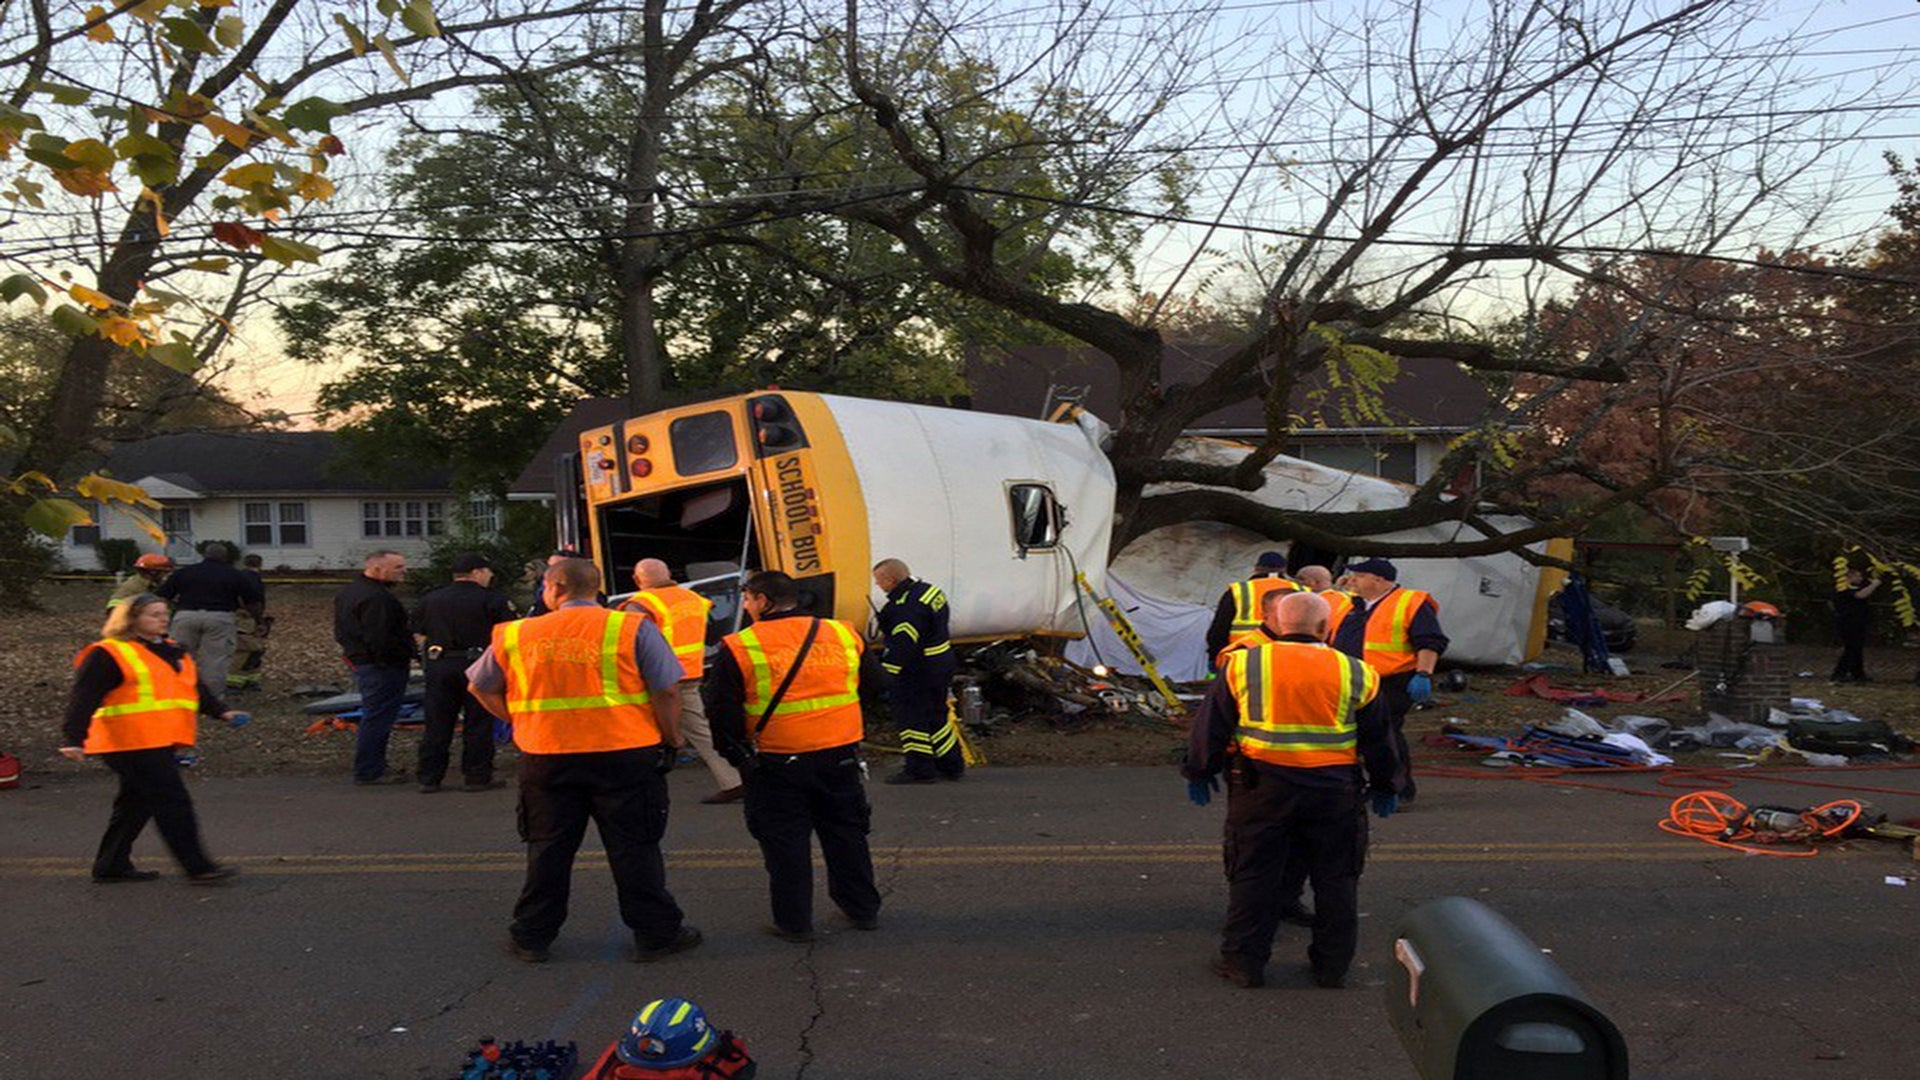 Boy, 8, Barely Survives School Bus Crash That Killed His Big Sister, Mom Reveals